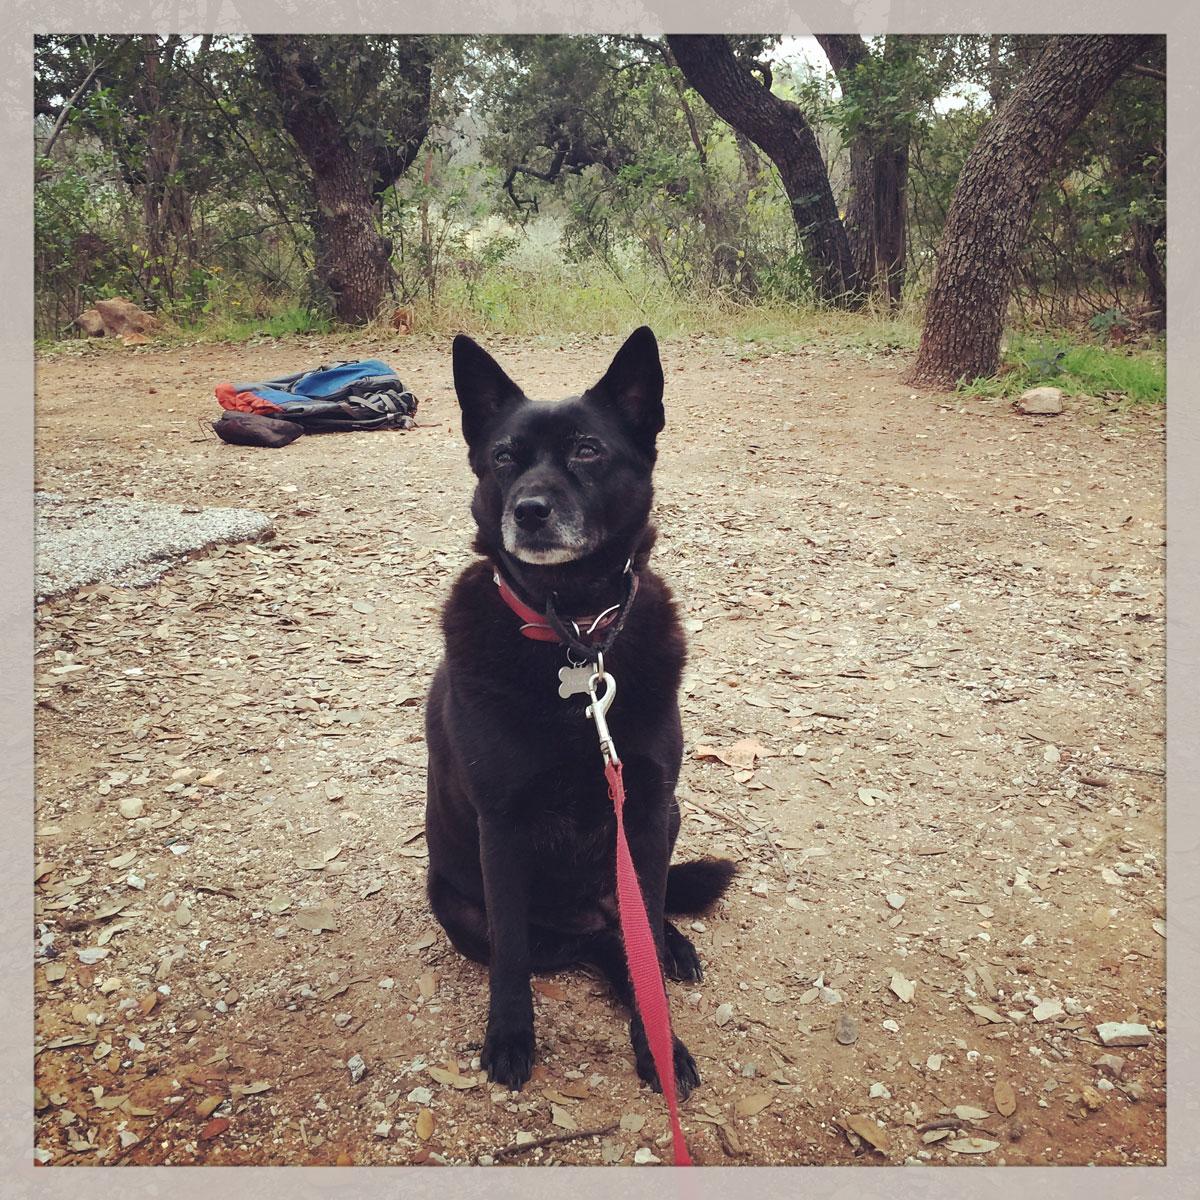 Daniela Lozano's dog, Nico, at Inks Lake State Park, December 2014. Photo by Daniela Lozano. Perro de Daniela Lozano, en Inks Lake State Park, diciembre 2014. Fotografía por Daniela Lozano.